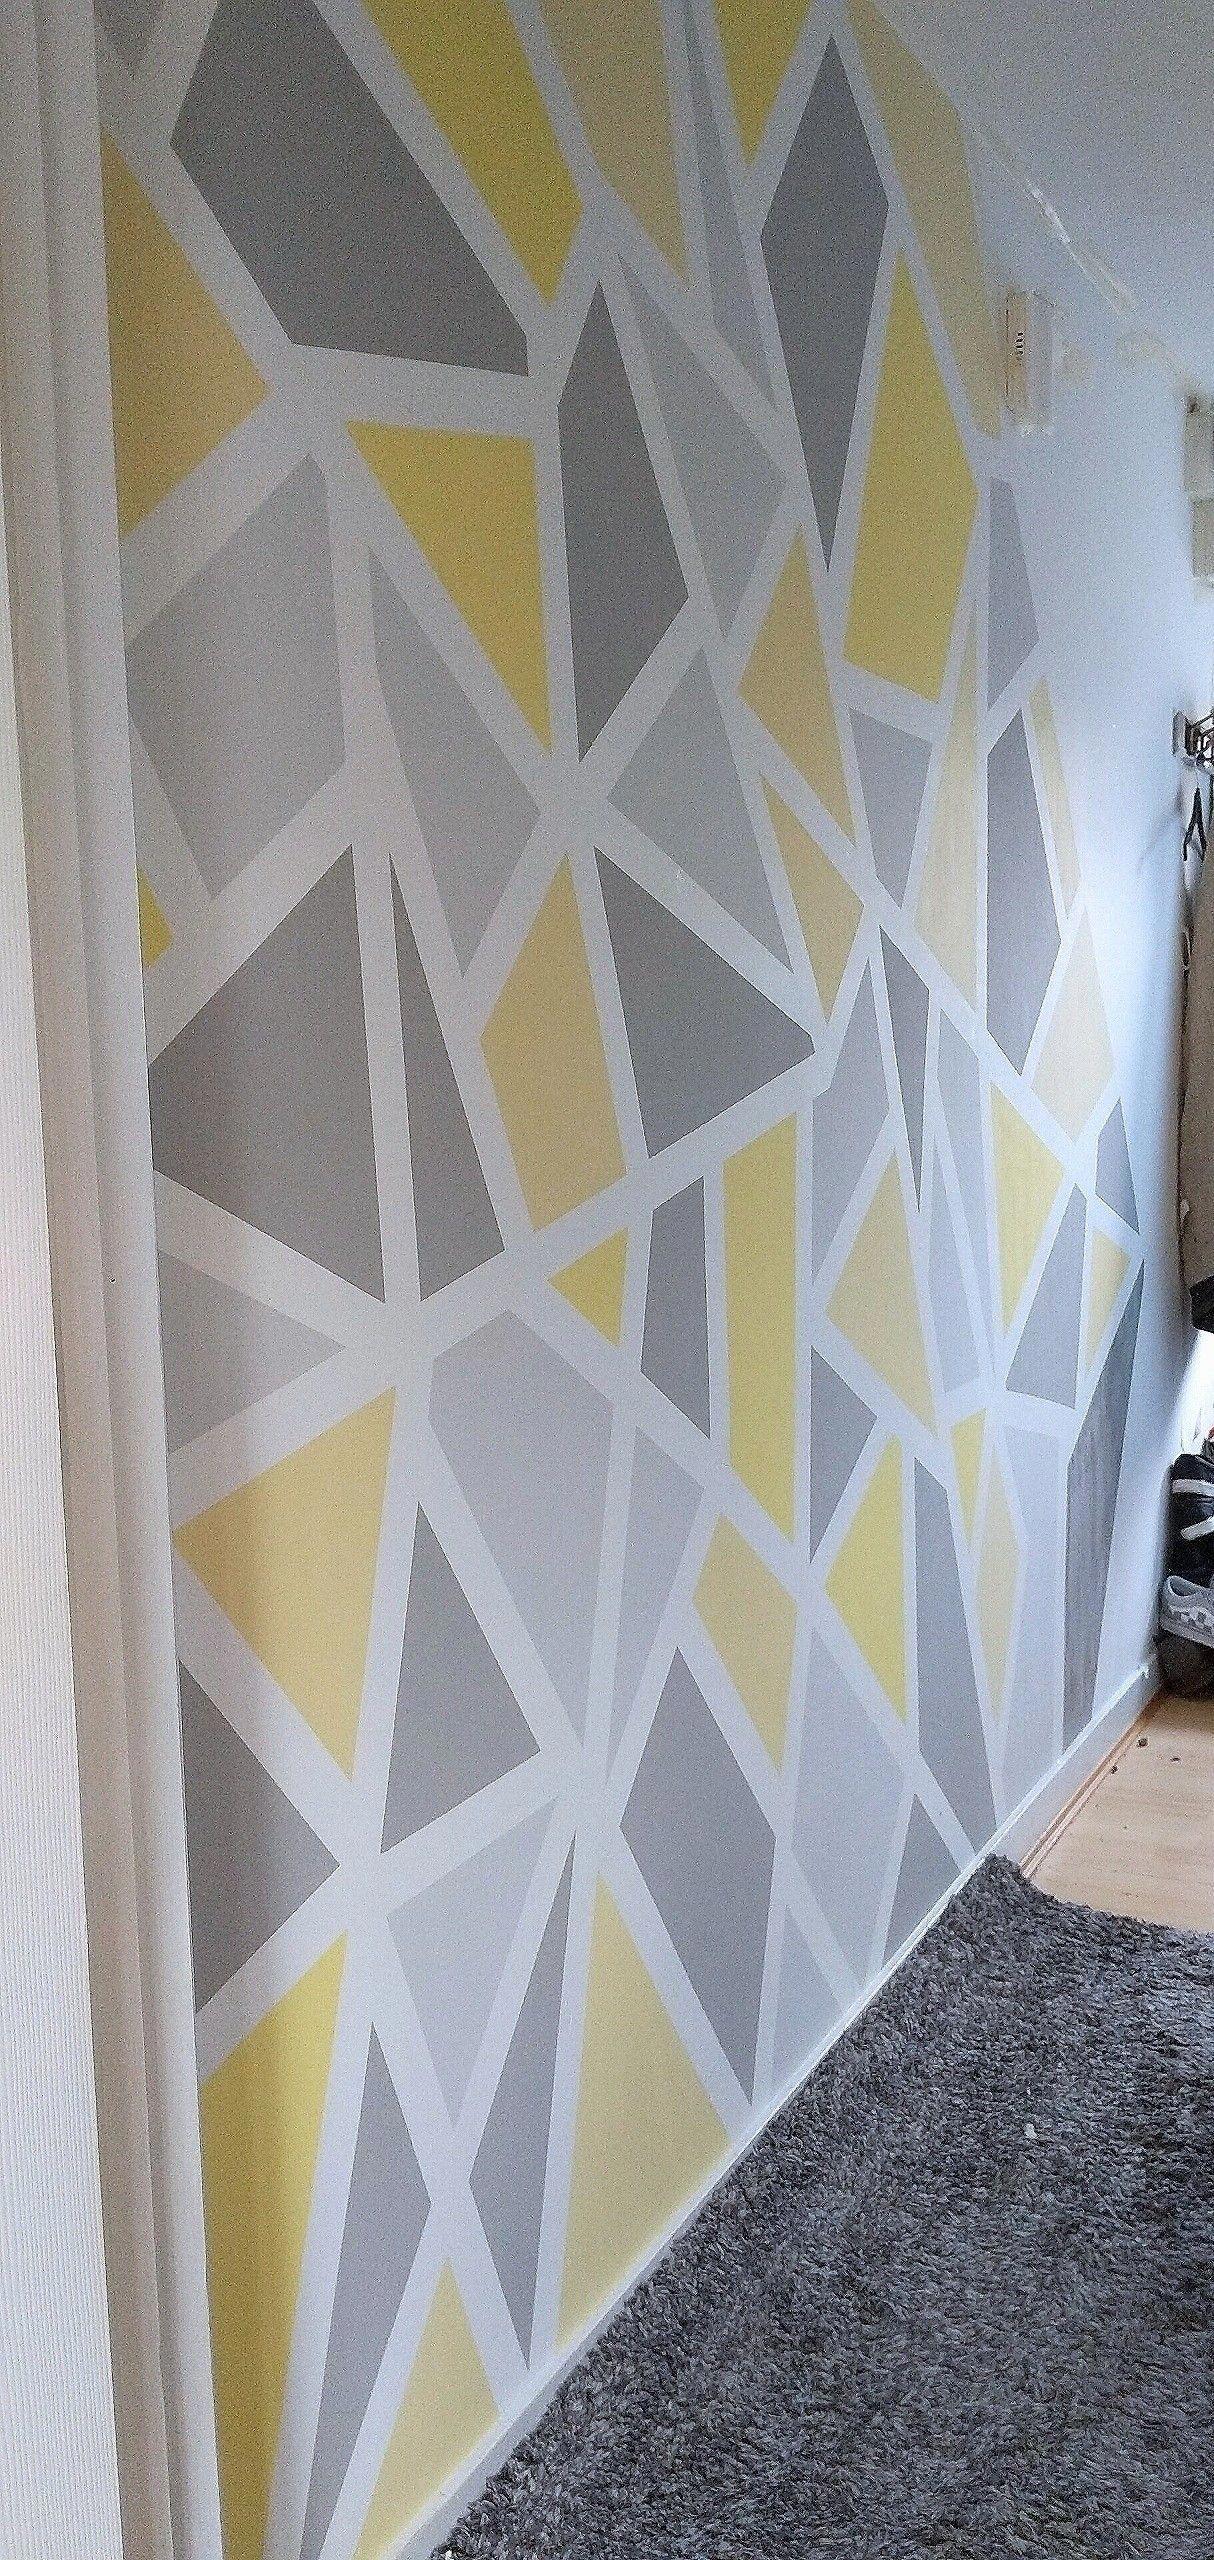 Geometric Wall Bedroom Wall Paint Geometric Wall Paint Diy Wall Painting